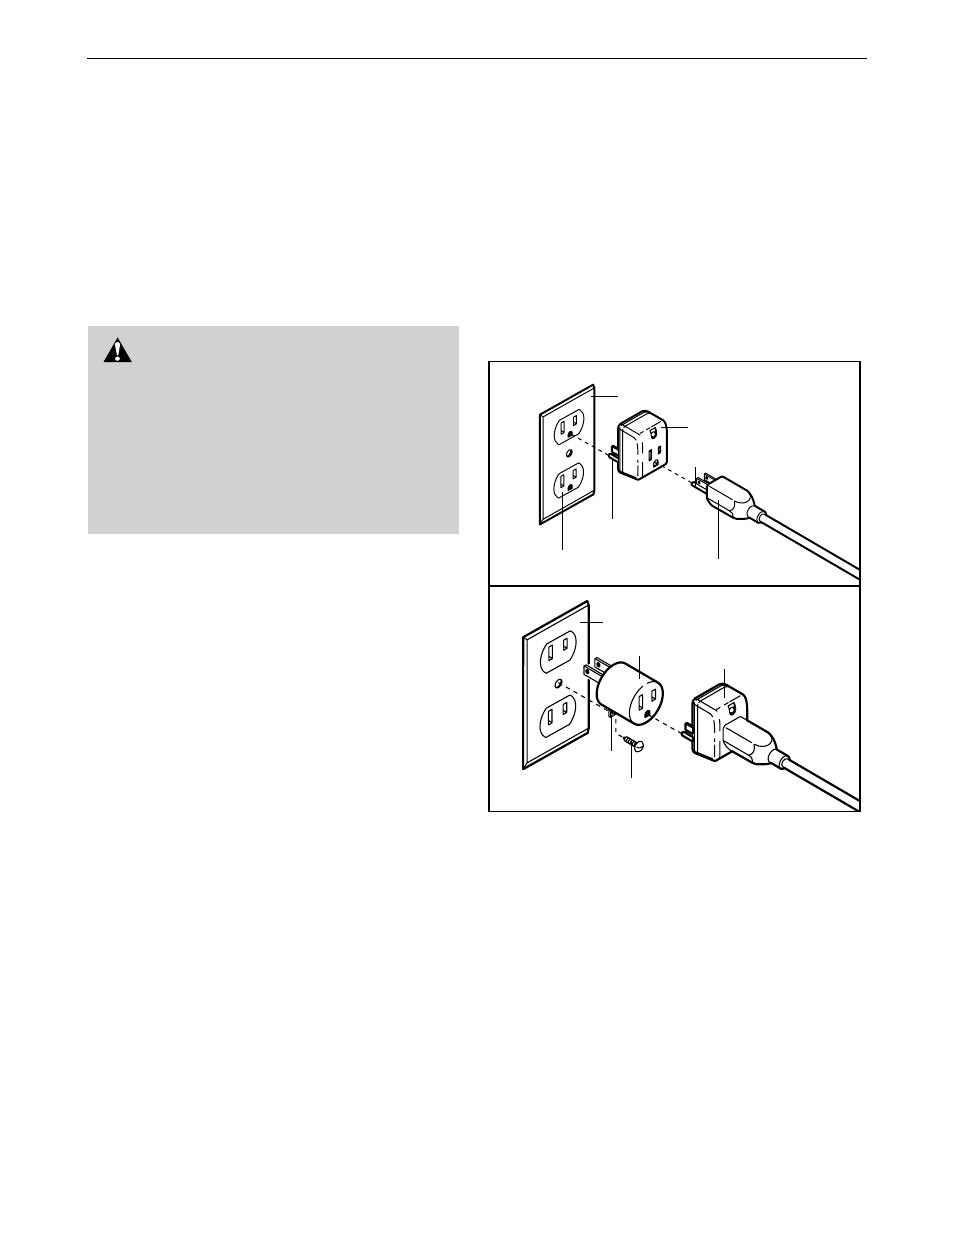 operation and adjustment danger proform 760 ekg user manual rh manualsdir com EKG Guide Book EKG Lead Placement